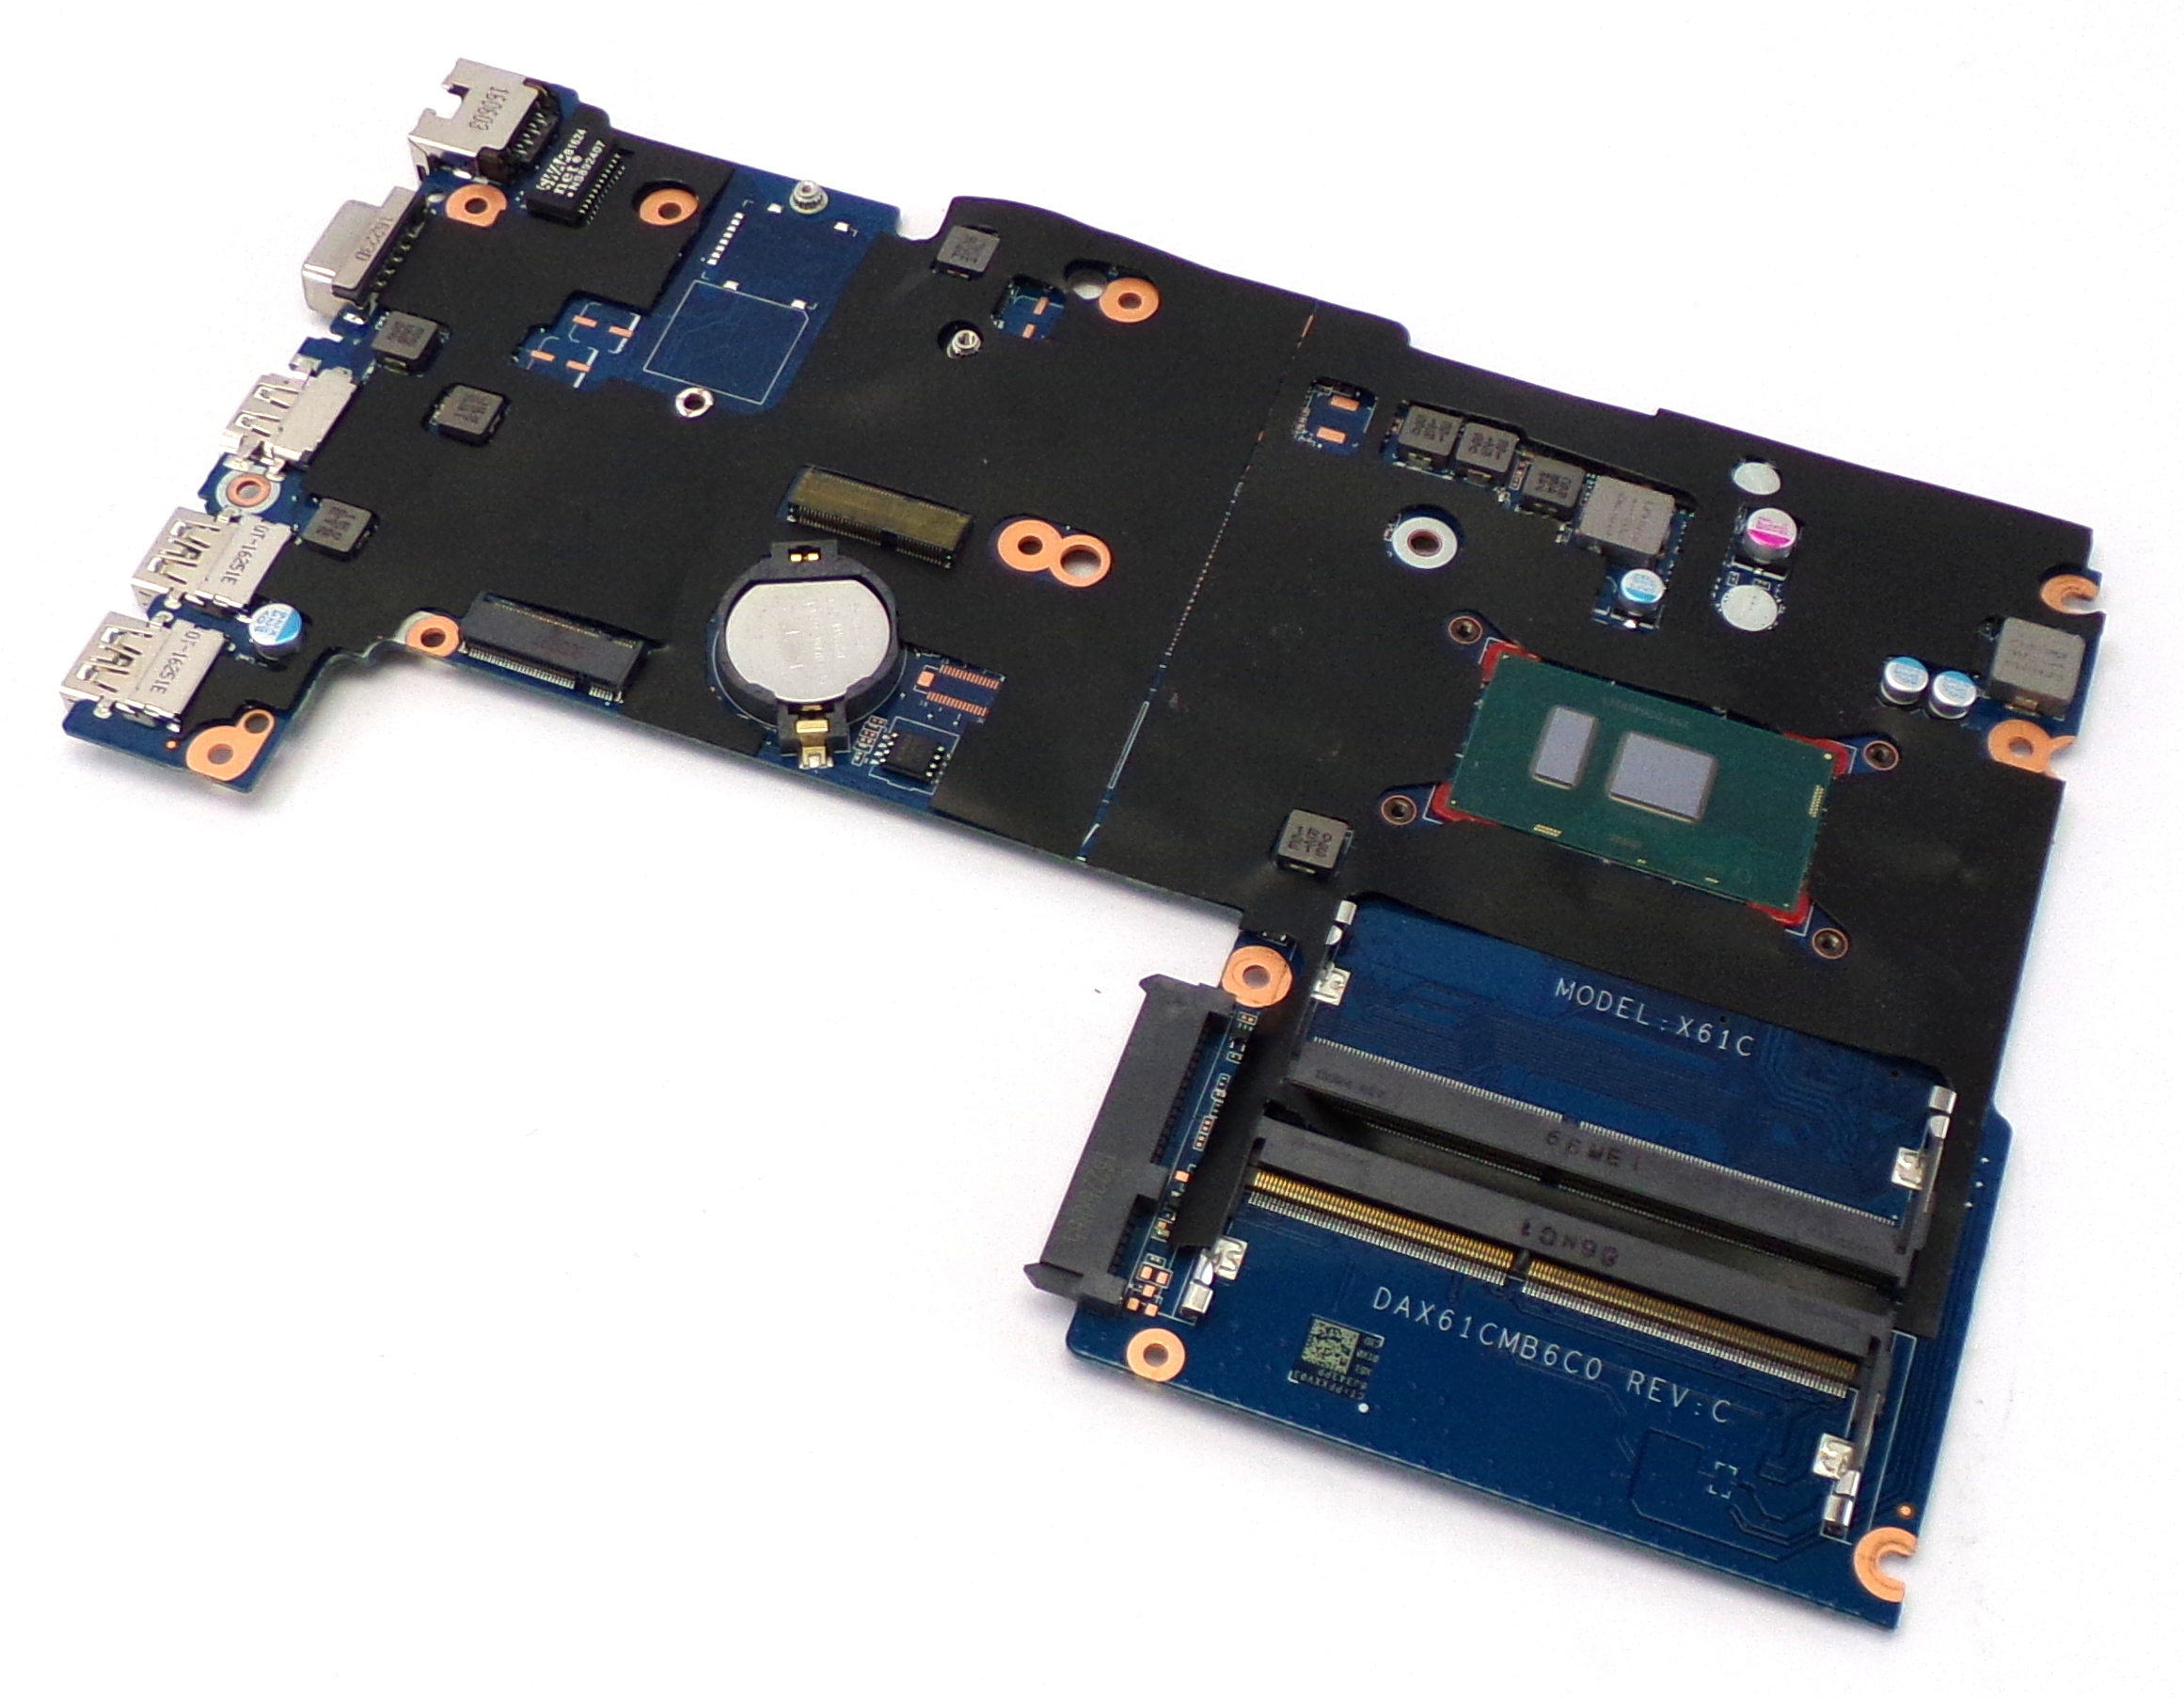 HP DAX61CMB6C0 ProBook 430 G3 with Intel Core i5-6200U Laptop Motherboard